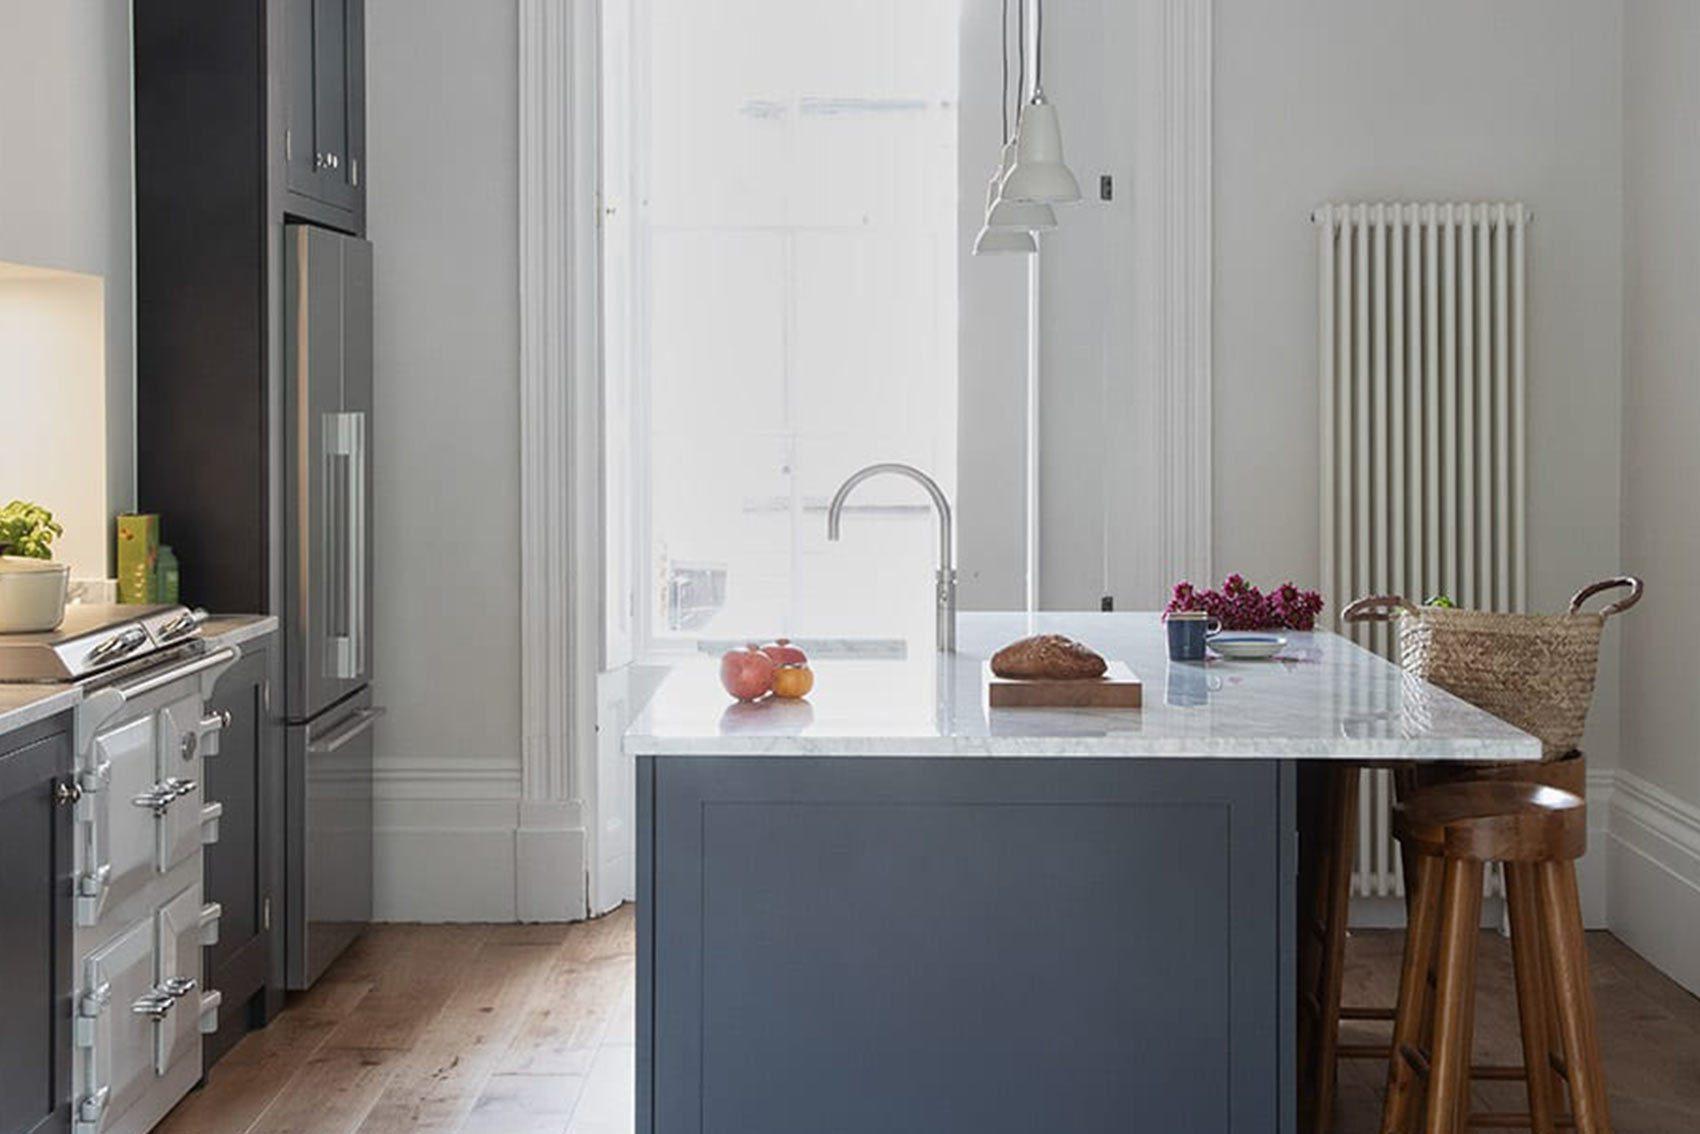 London showroom shaker kitchen feature island